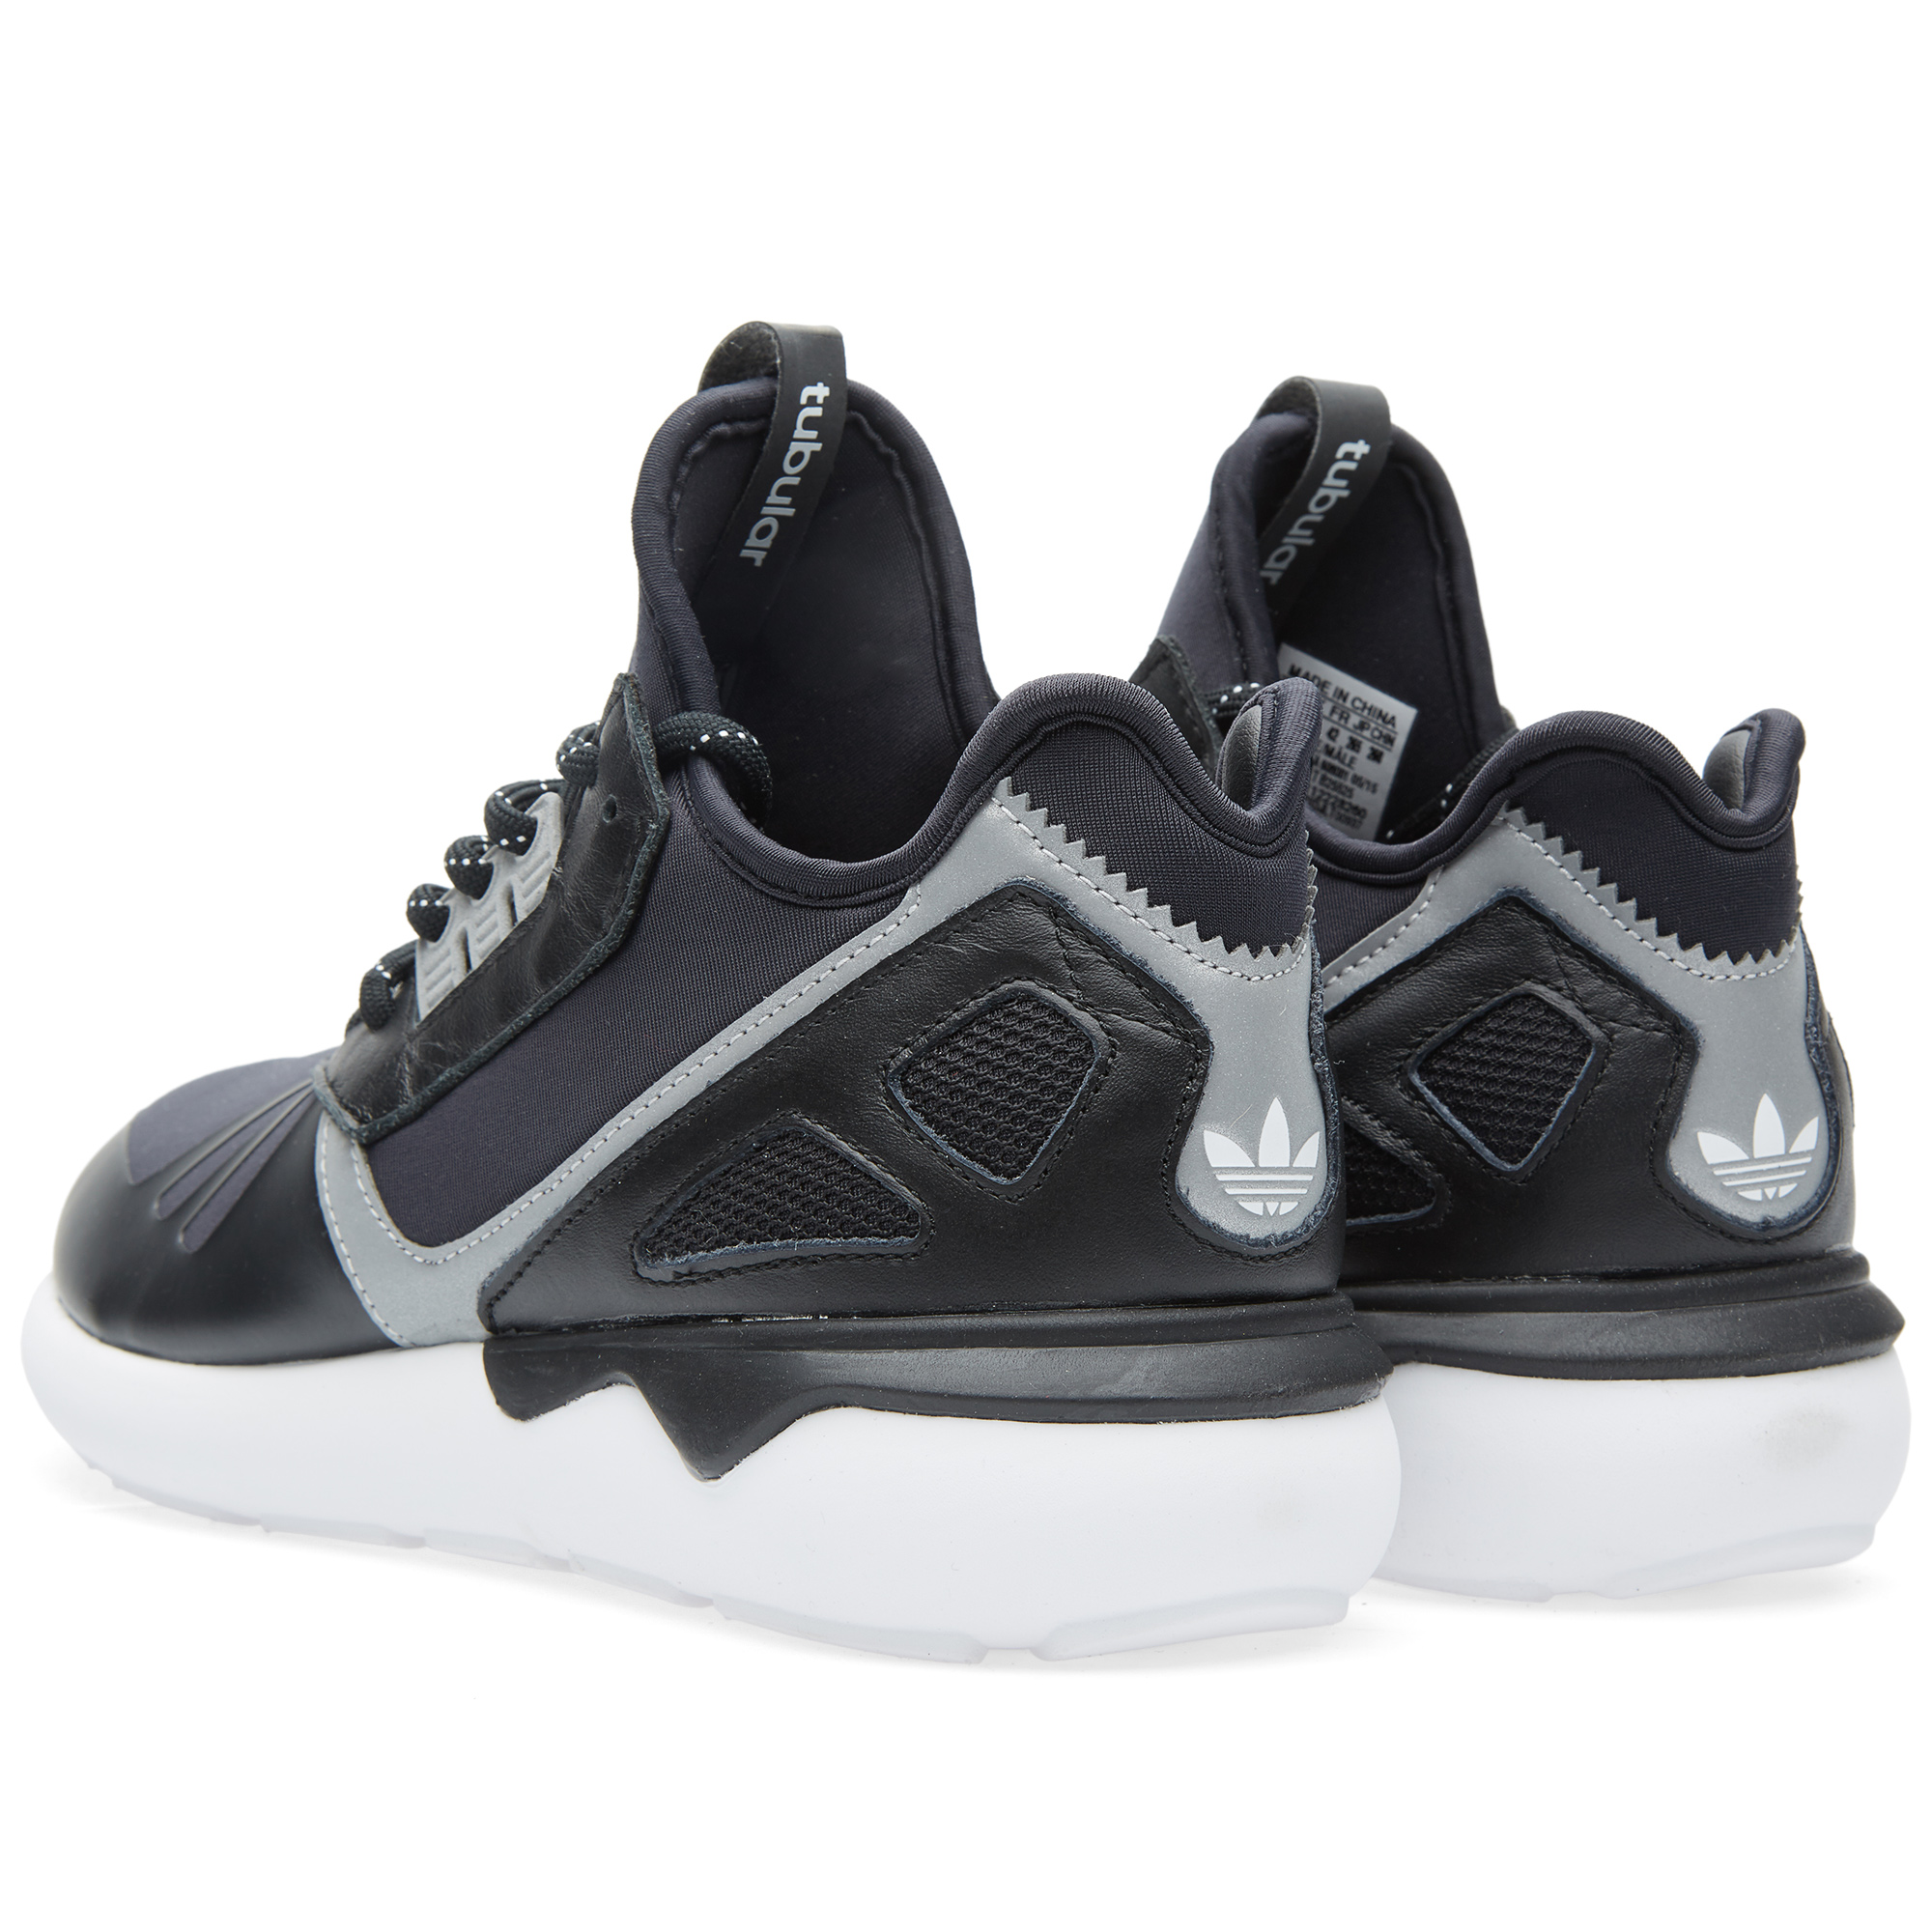 Adidas Tubular Runner Black And White